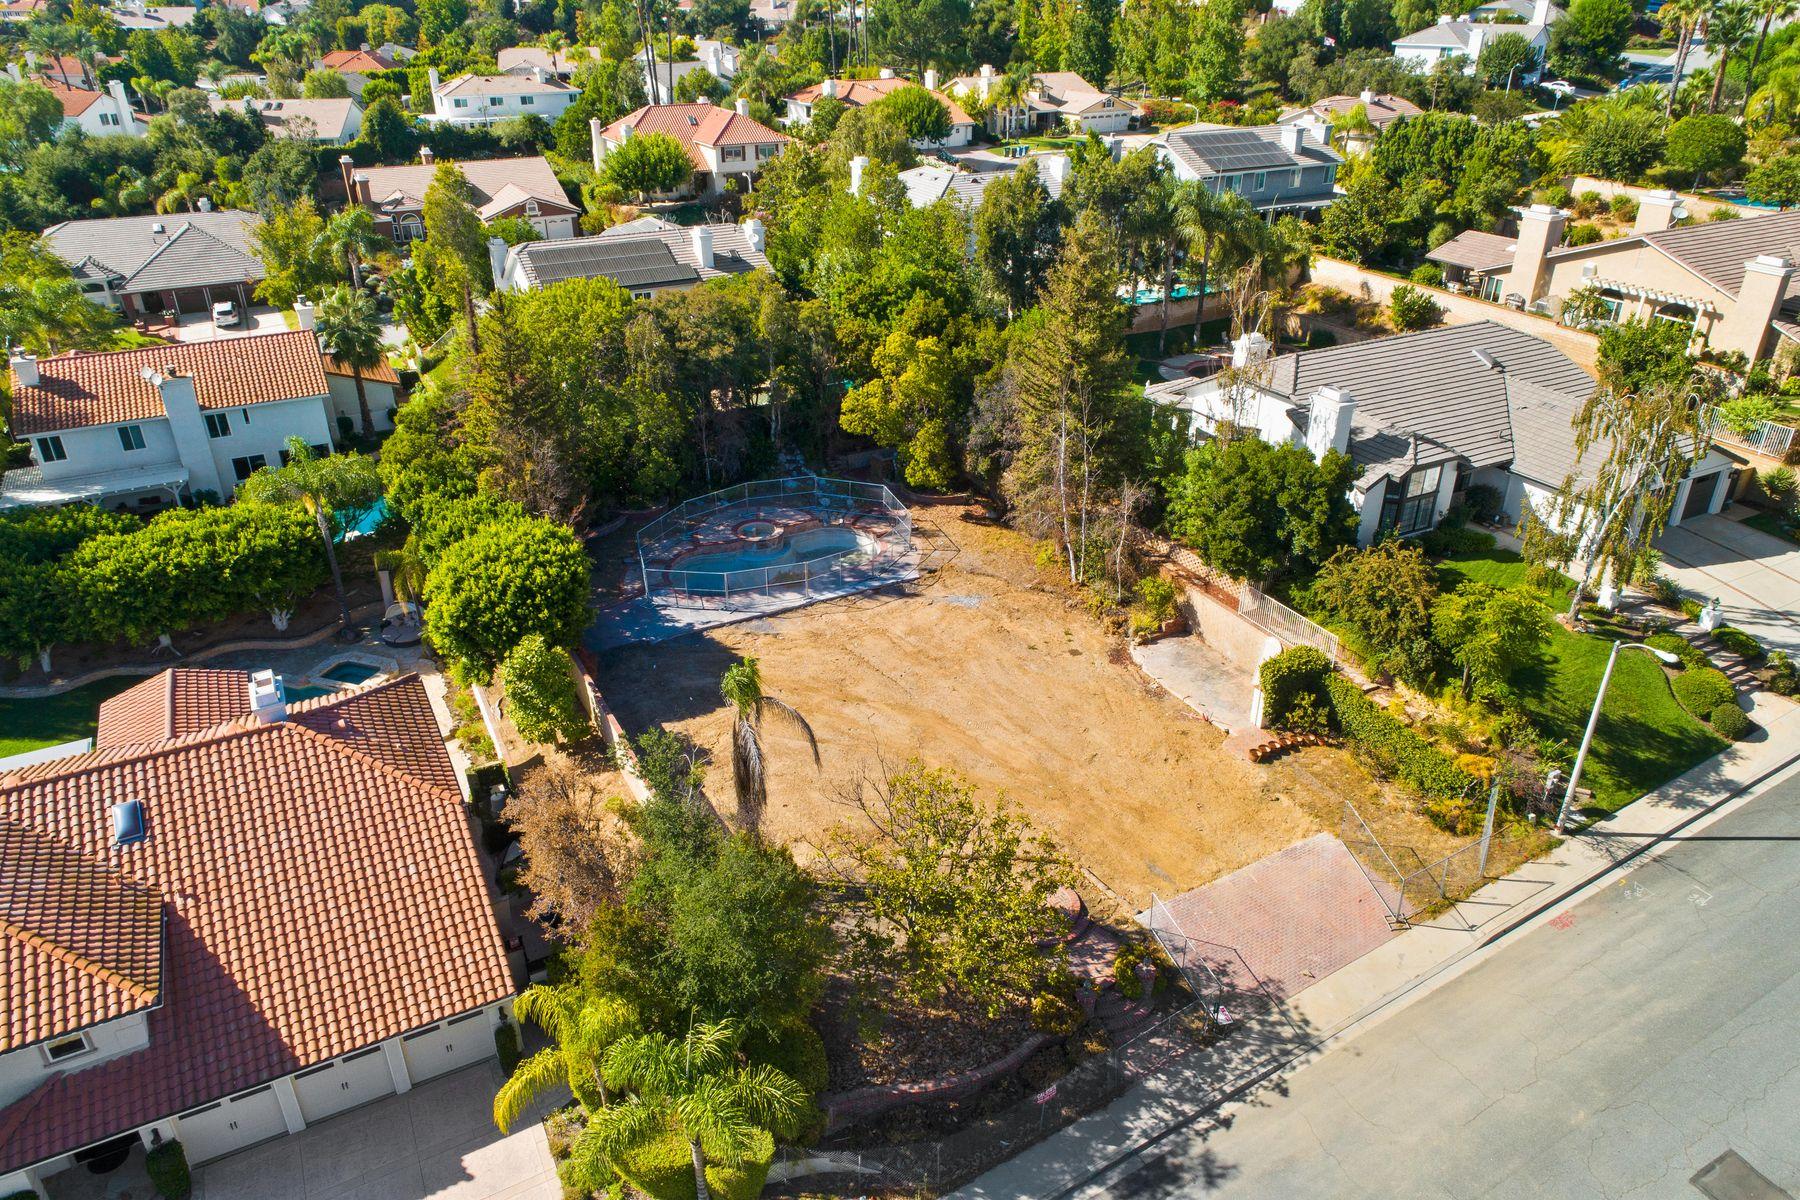 Land for Sale at 1241 Hidden Springs Ave. 1241 Hidden Springs Avenue Oak Park, California 91377 United States